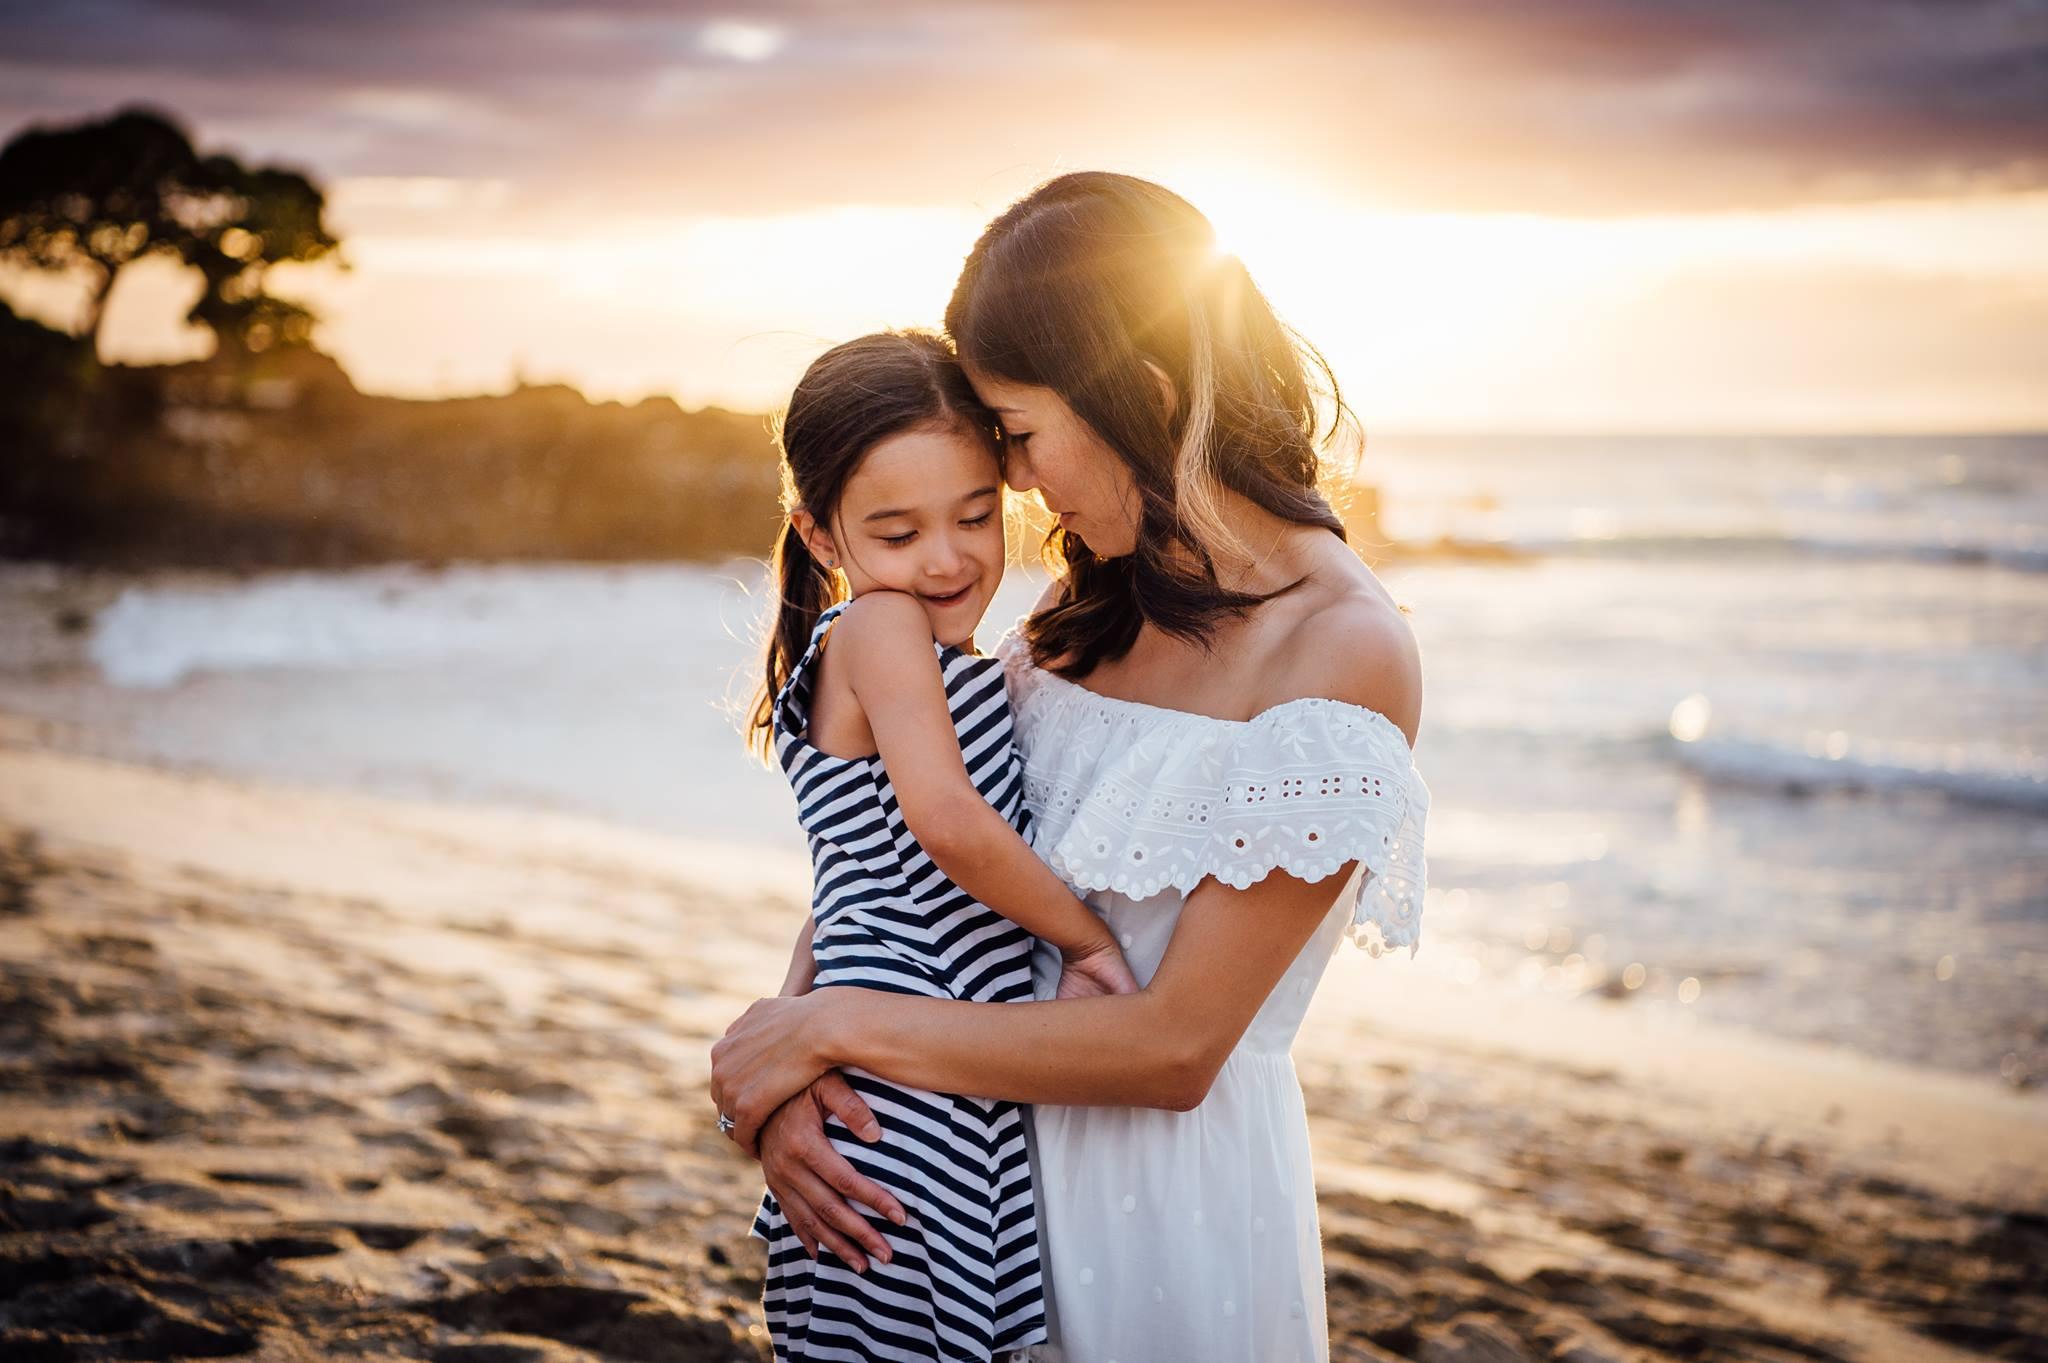 beautiful sunset love connected emotive family photography posing ann armenia